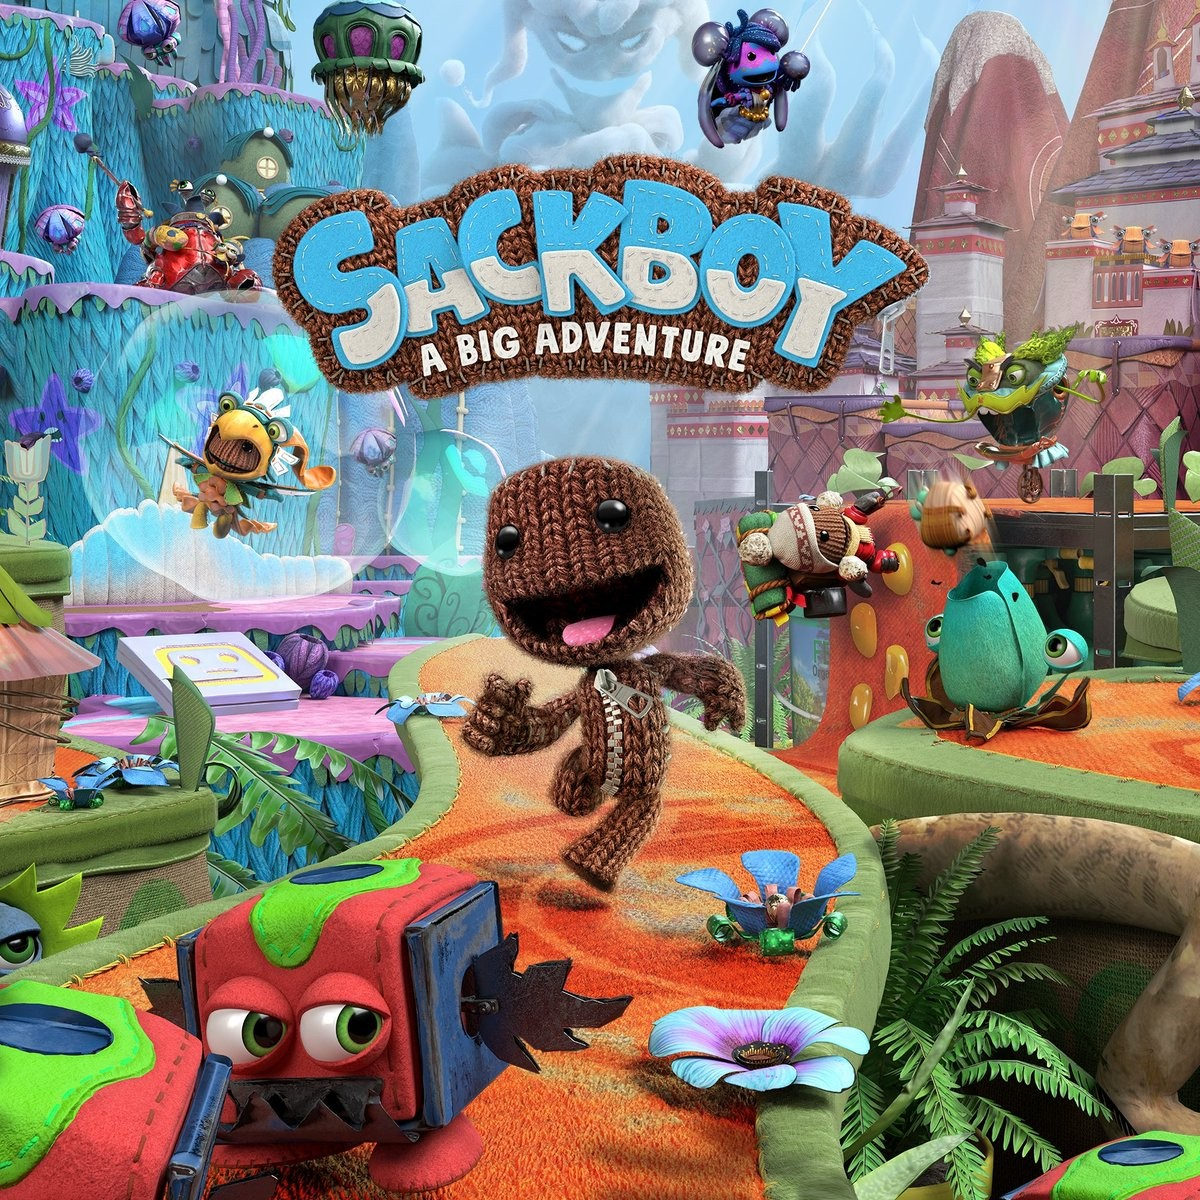 Прокат Sackboy A Big Adventure | Секбой Велика пригода від 7 днів PS4/PS5